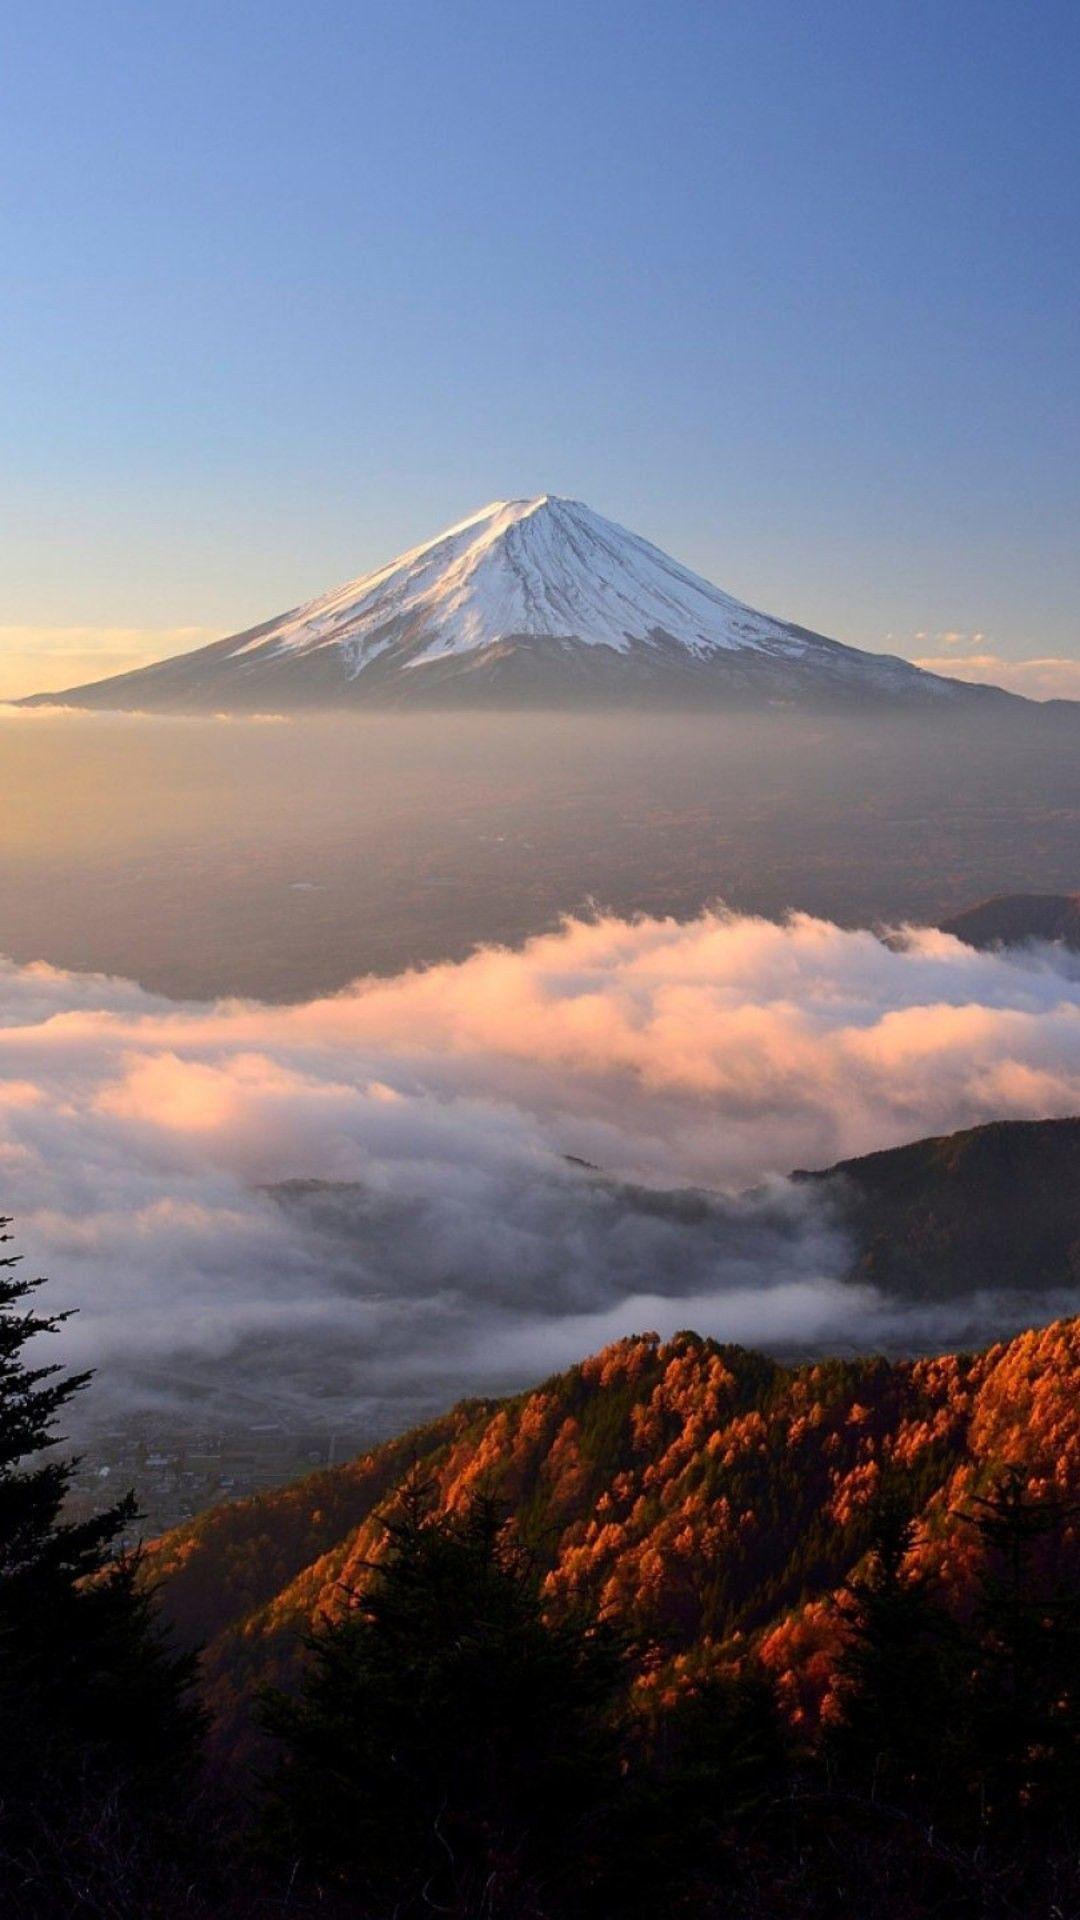 Mount Fuji HD Pretty Wallpapers - Top Free Mount Fuji HD Pretty Backgrounds - WallpaperAccess